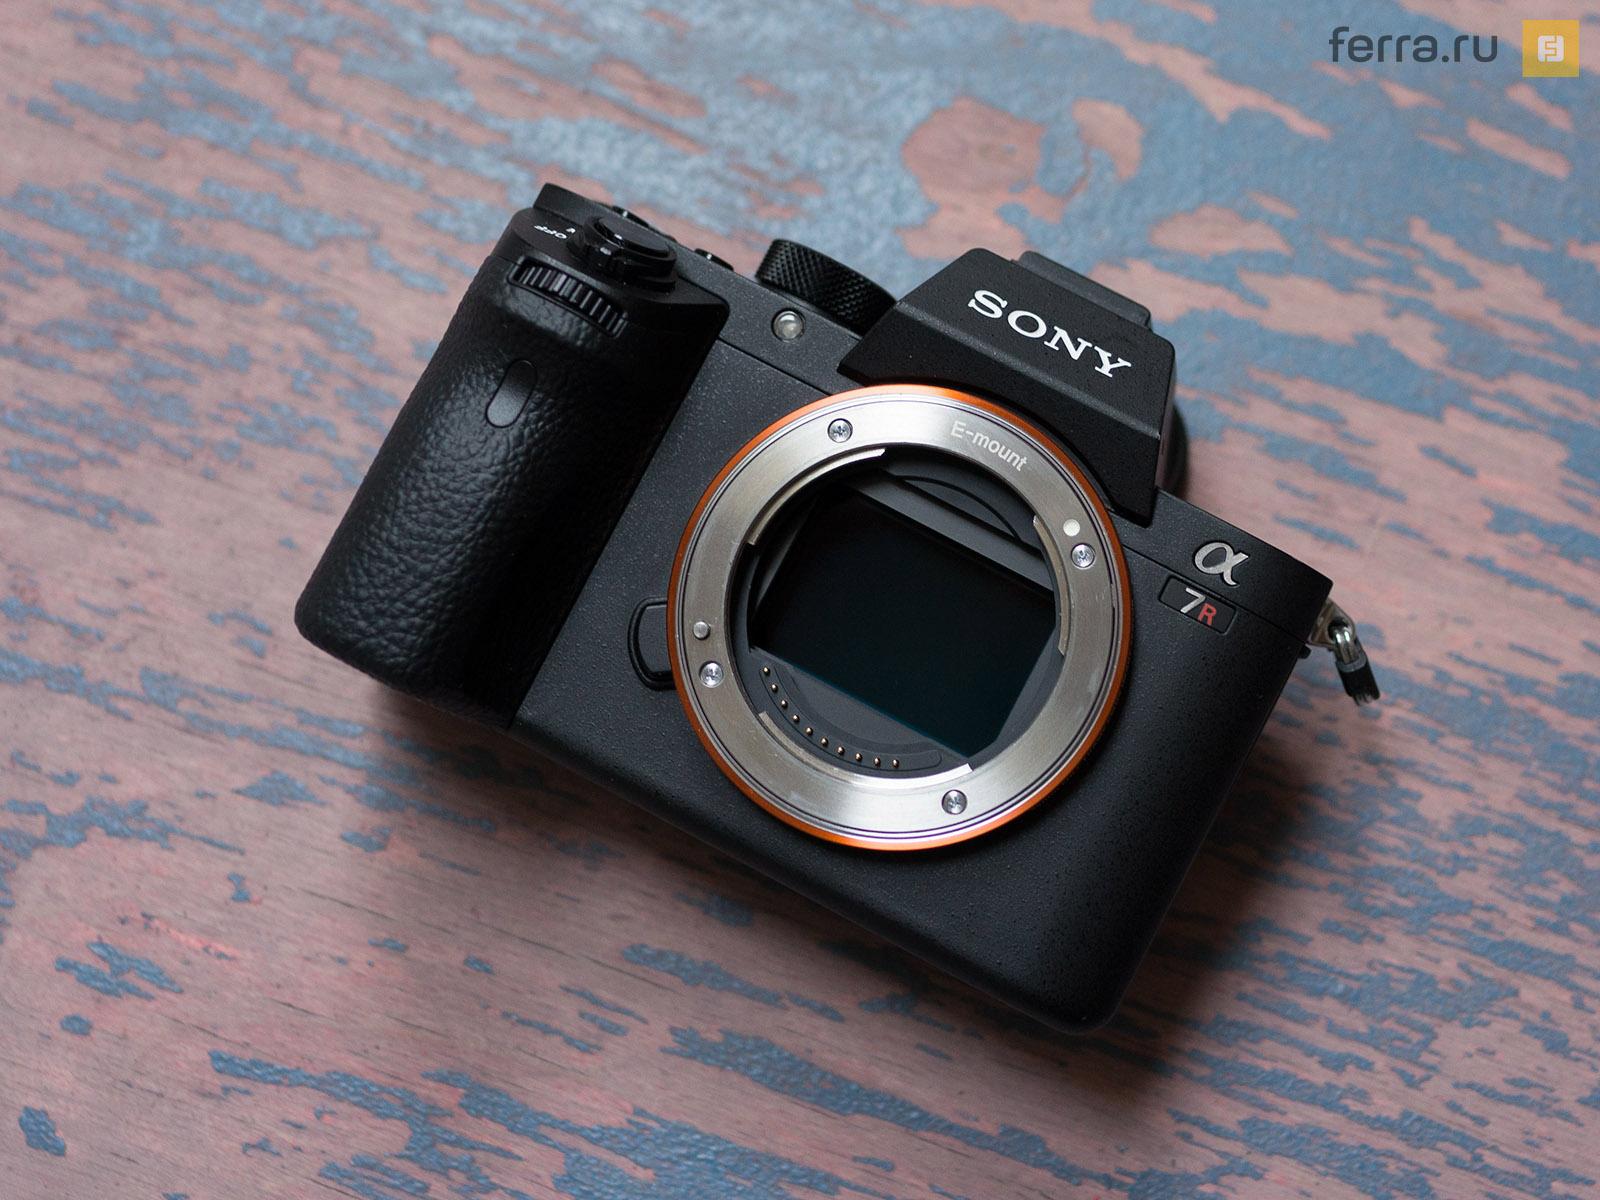 Assistenza fotocamere sony roma 27